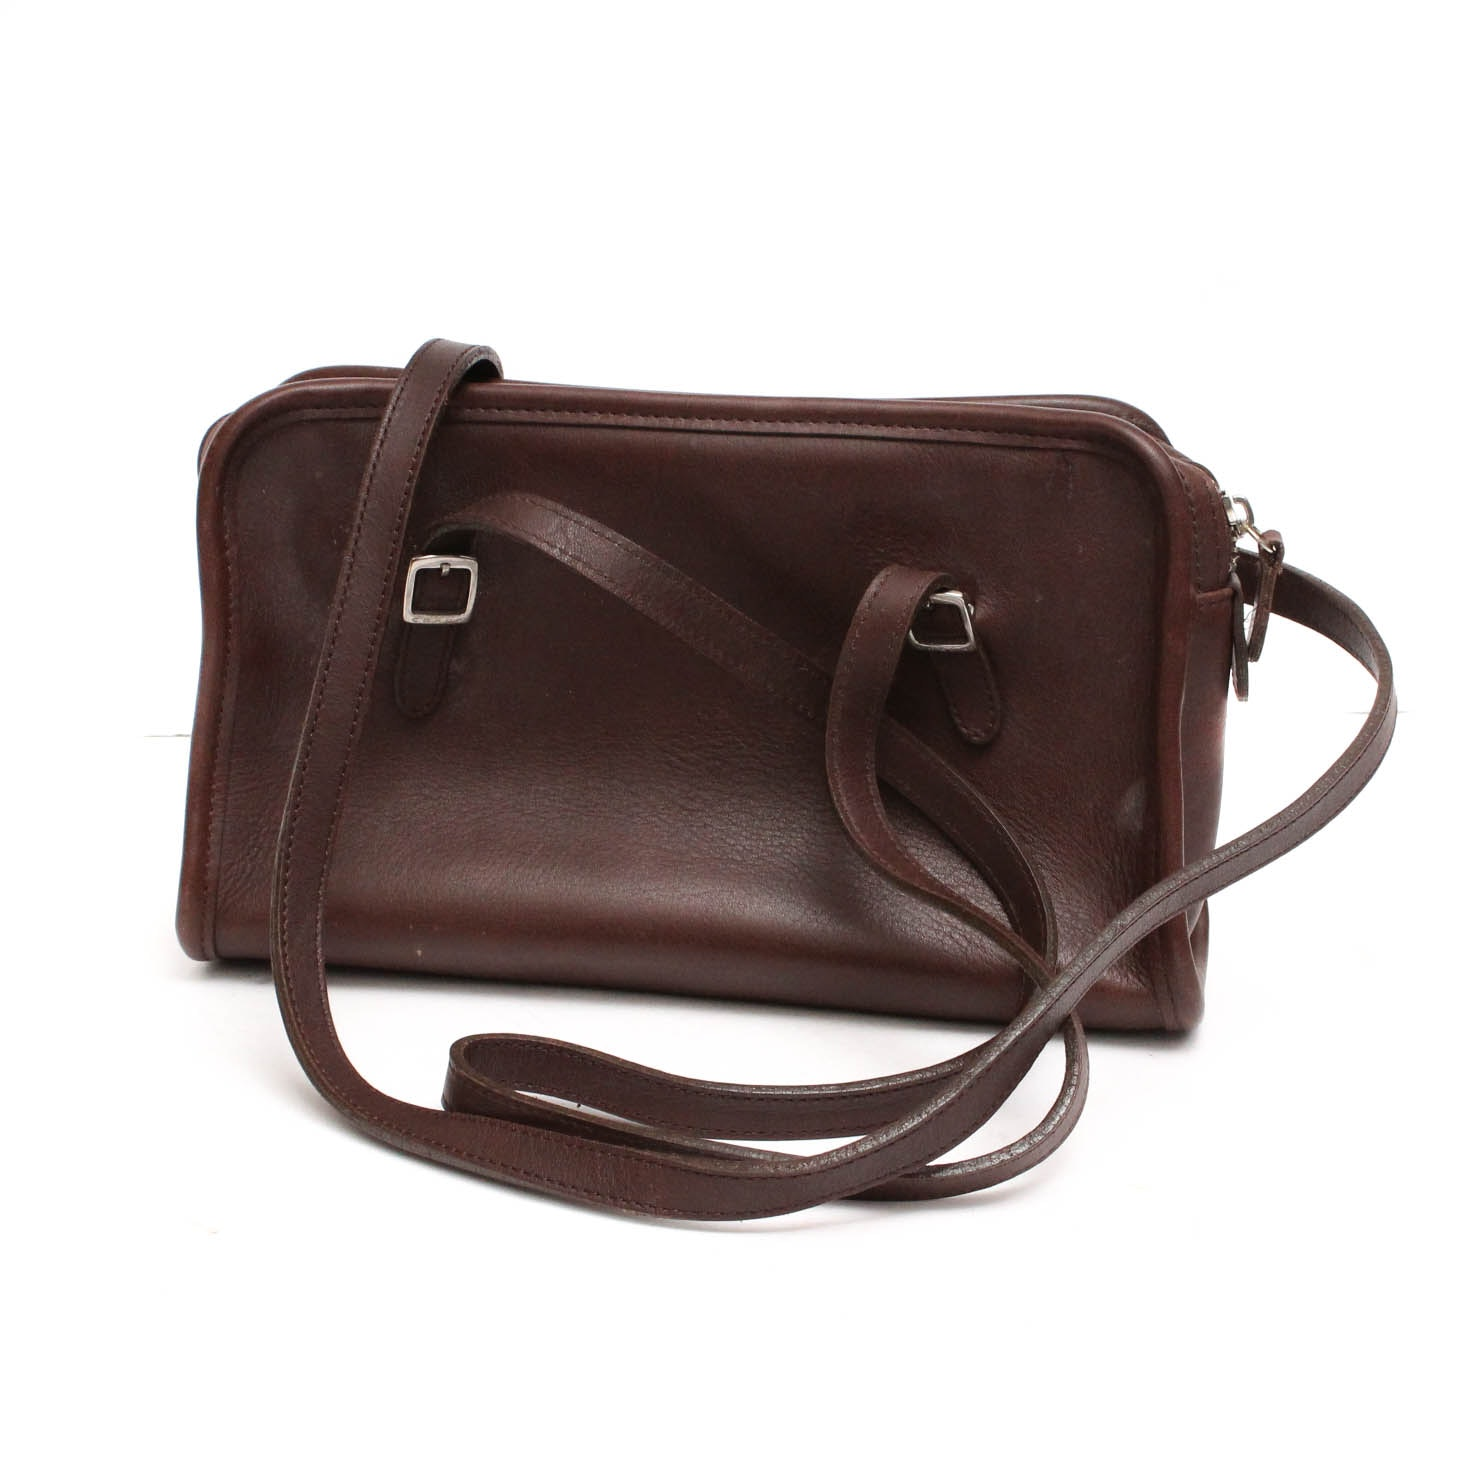 Vintage Coach Swing Zip Brown Leather Shoulder Bag